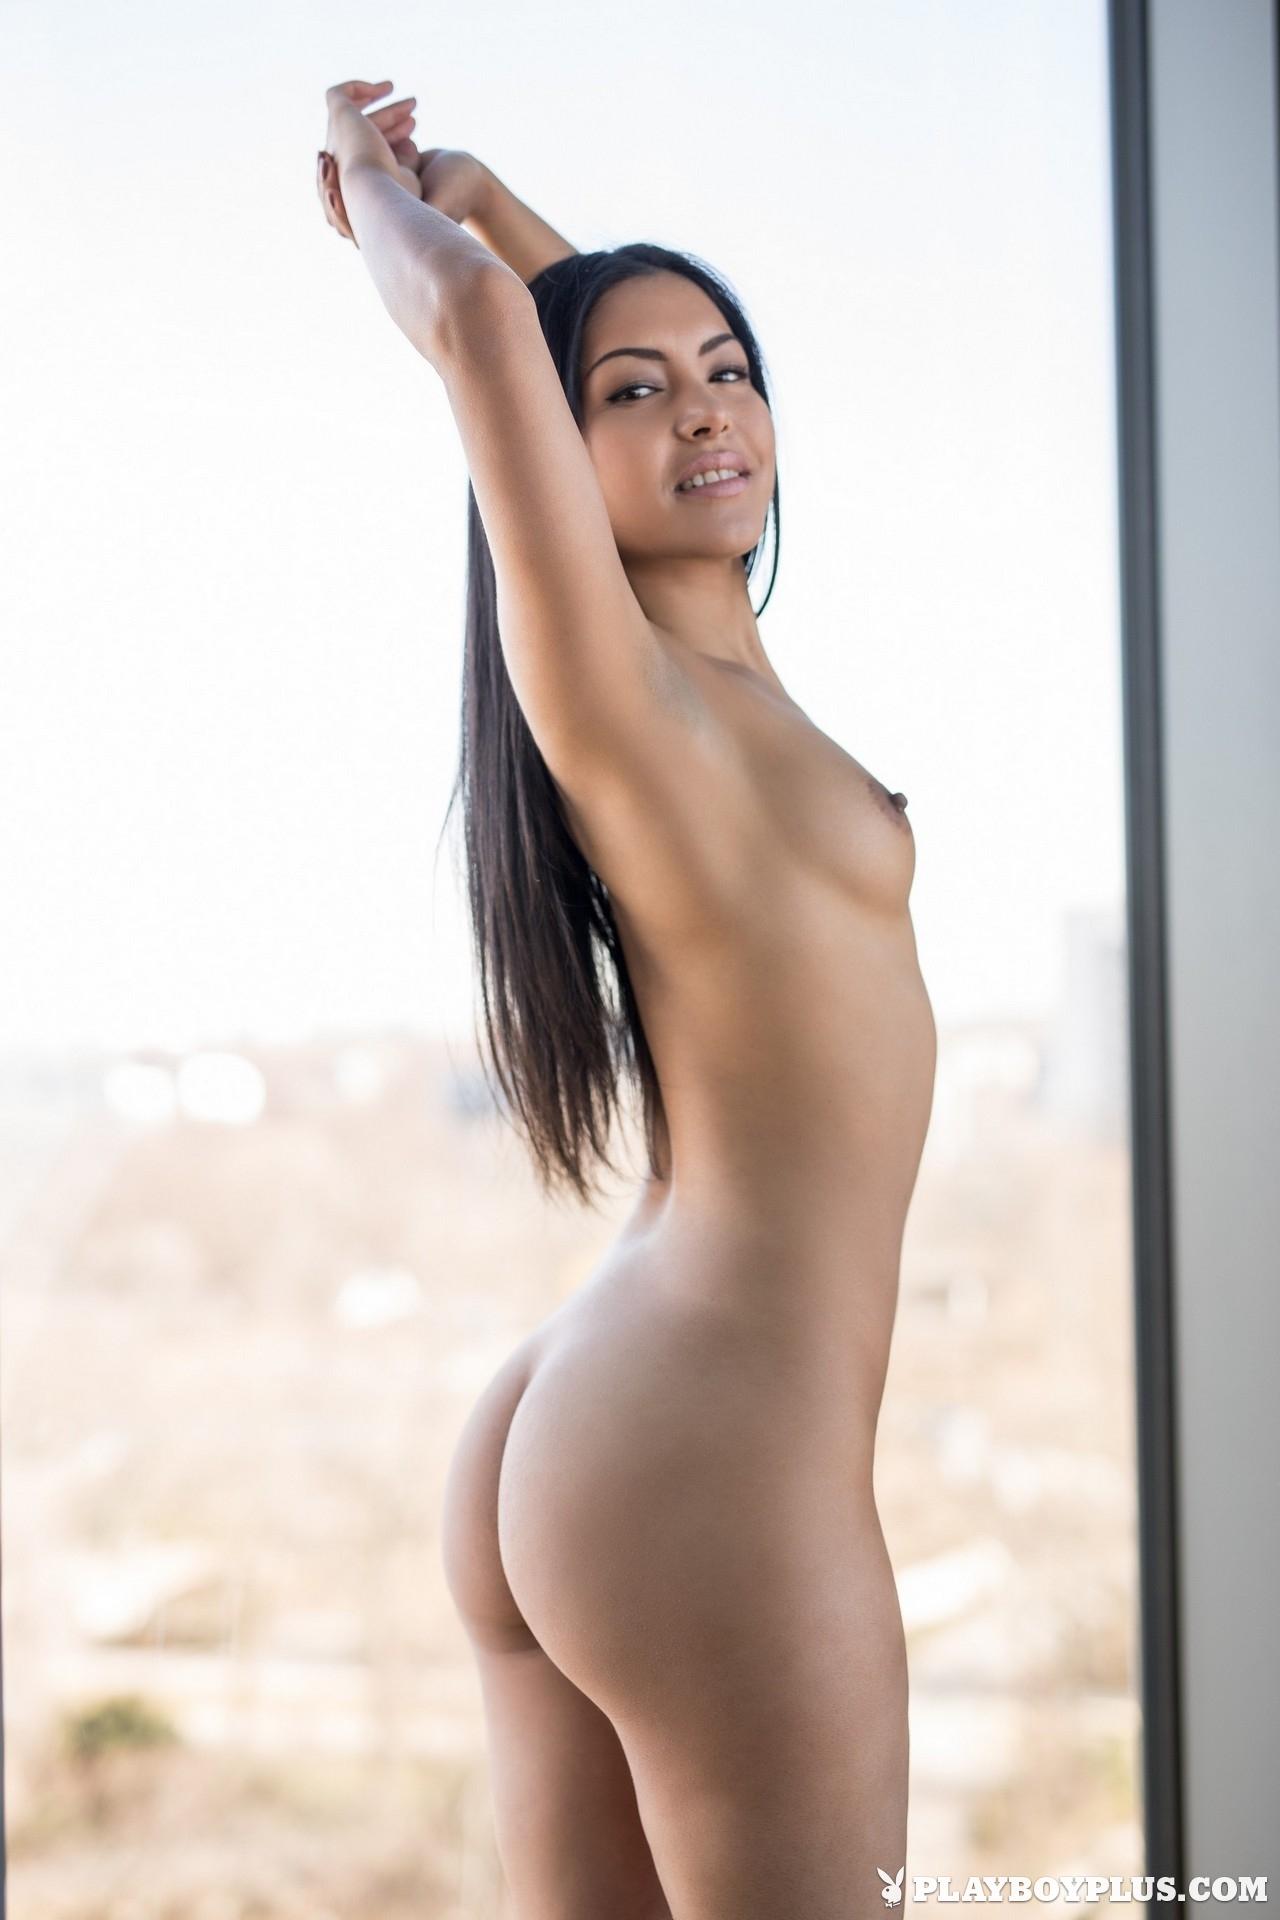 Playboy Plus Chloe Rose In Inspiring View (23)